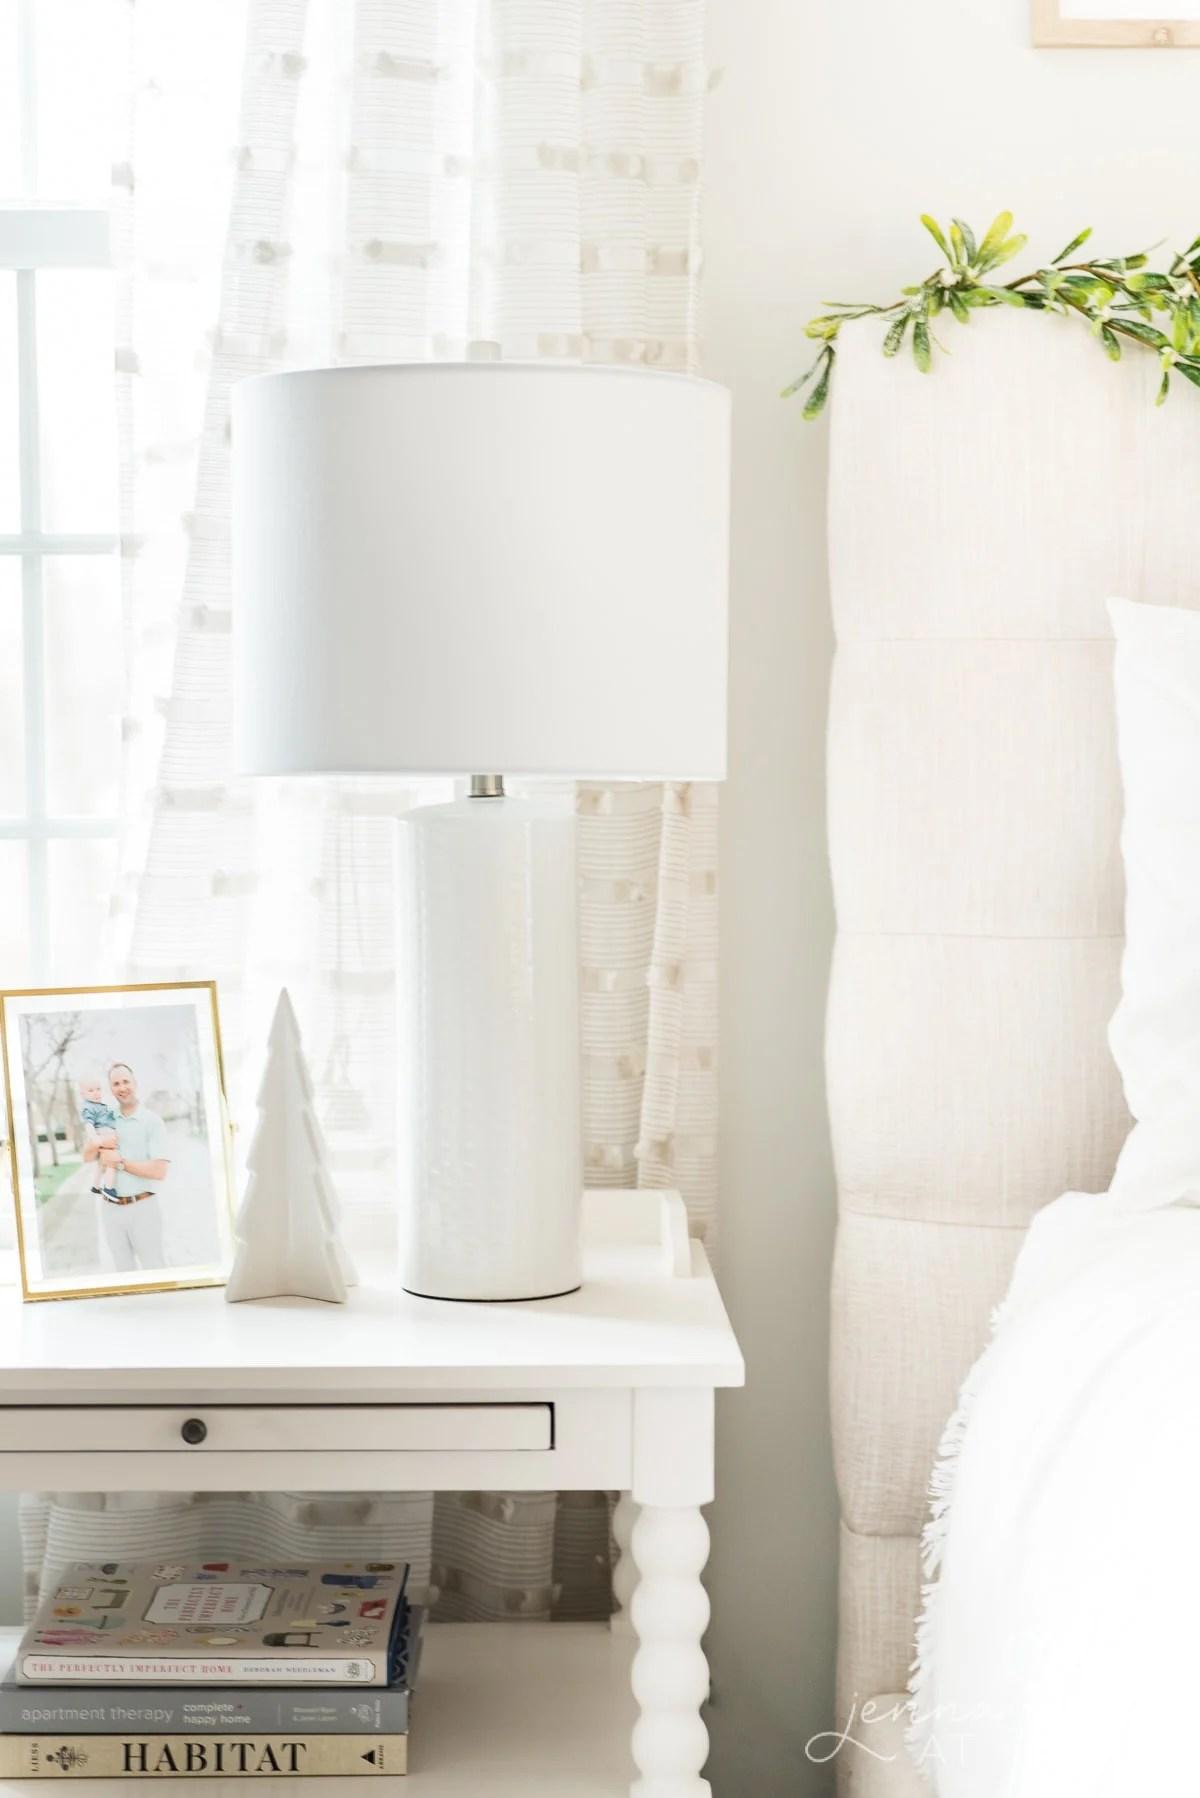 Simple white ceramic Christmas tree on the nightstand